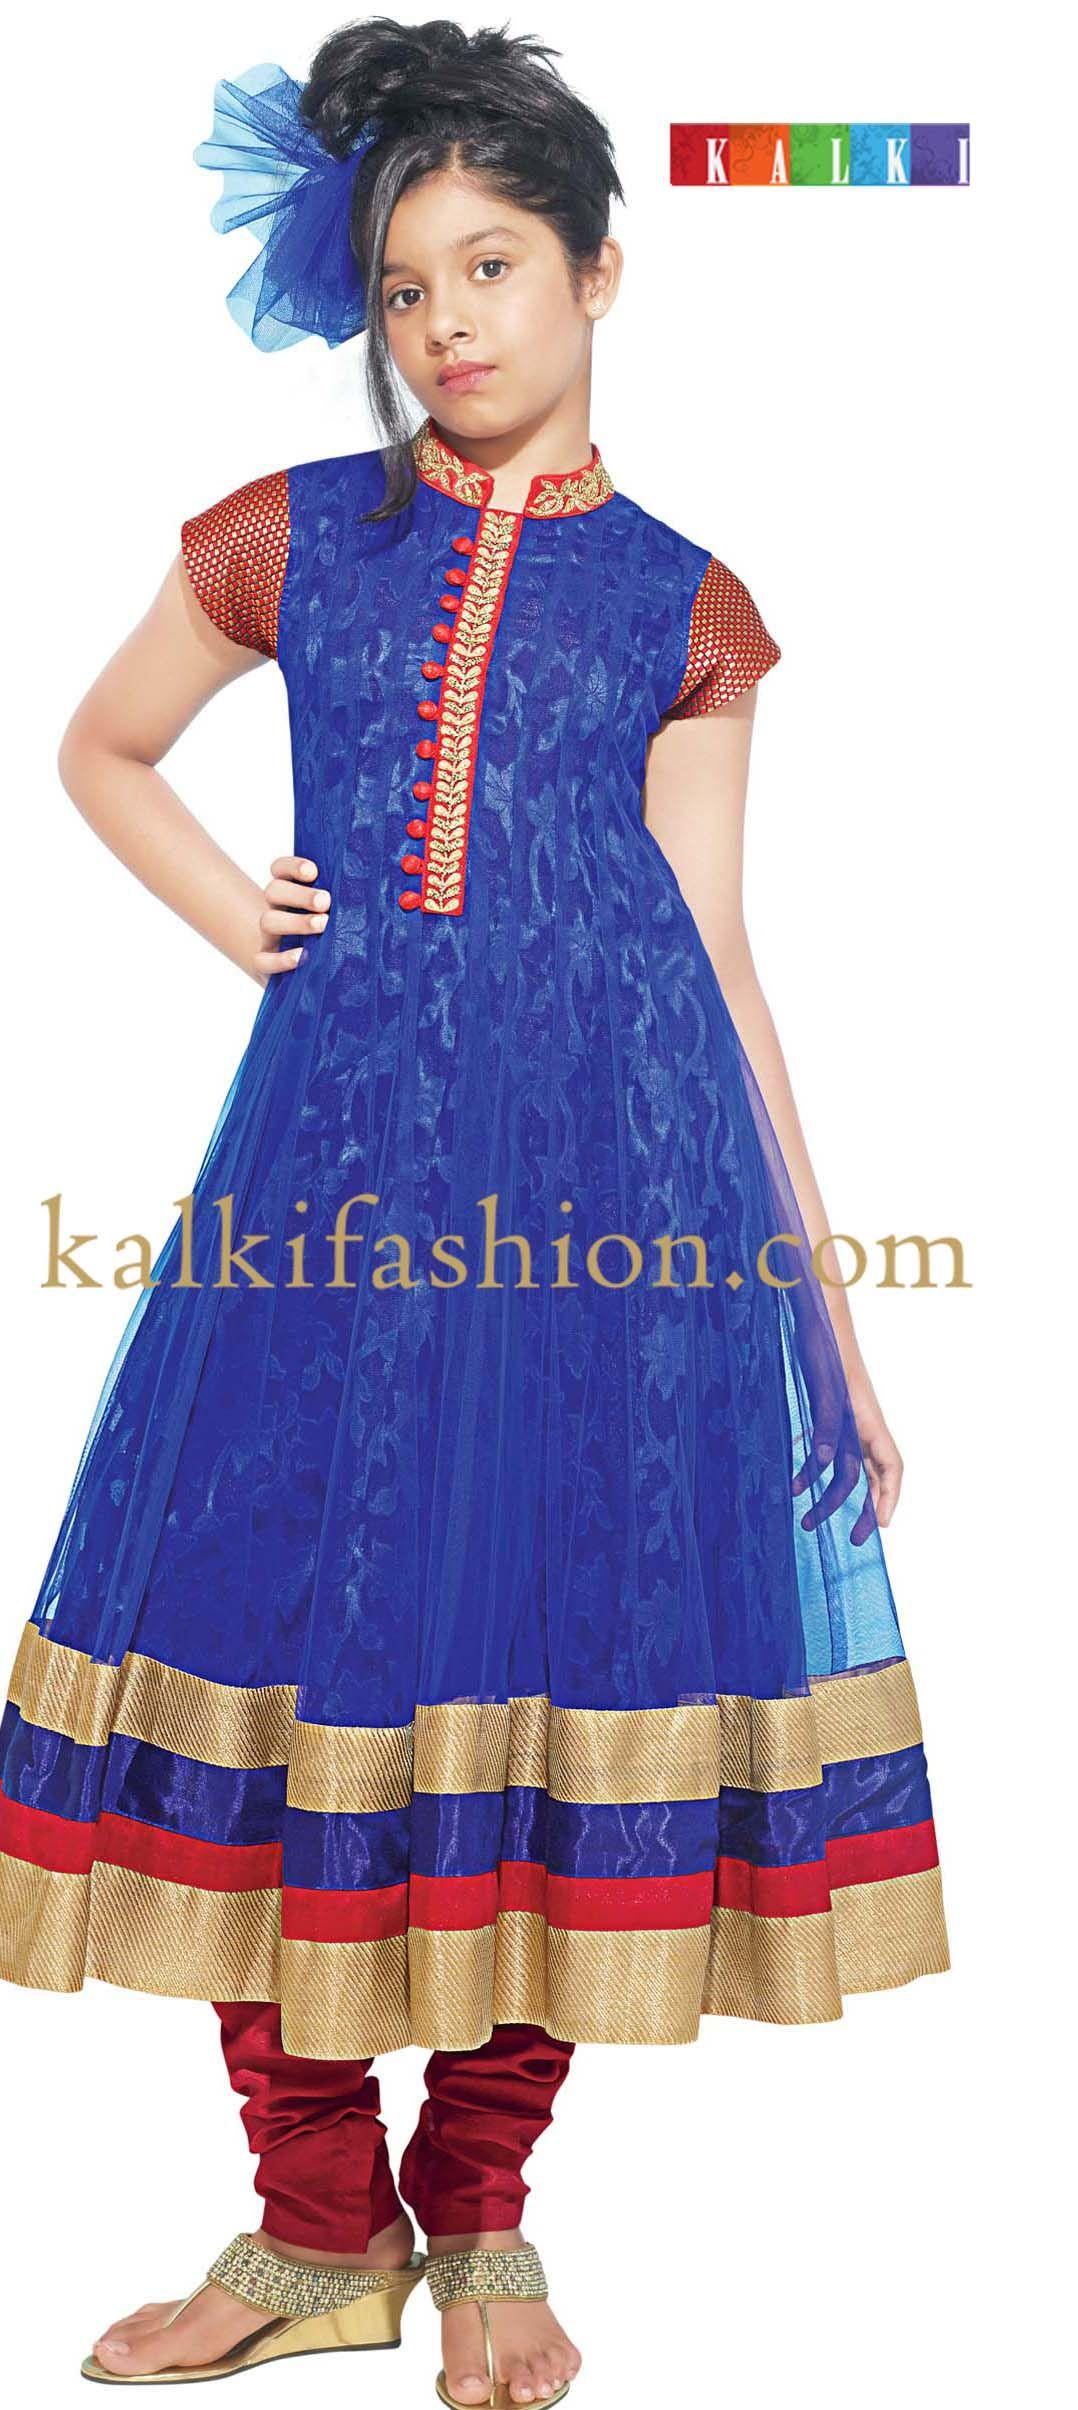 Buy it now http://www.kalkifashion.com/blue-anarkali-dress-with ...